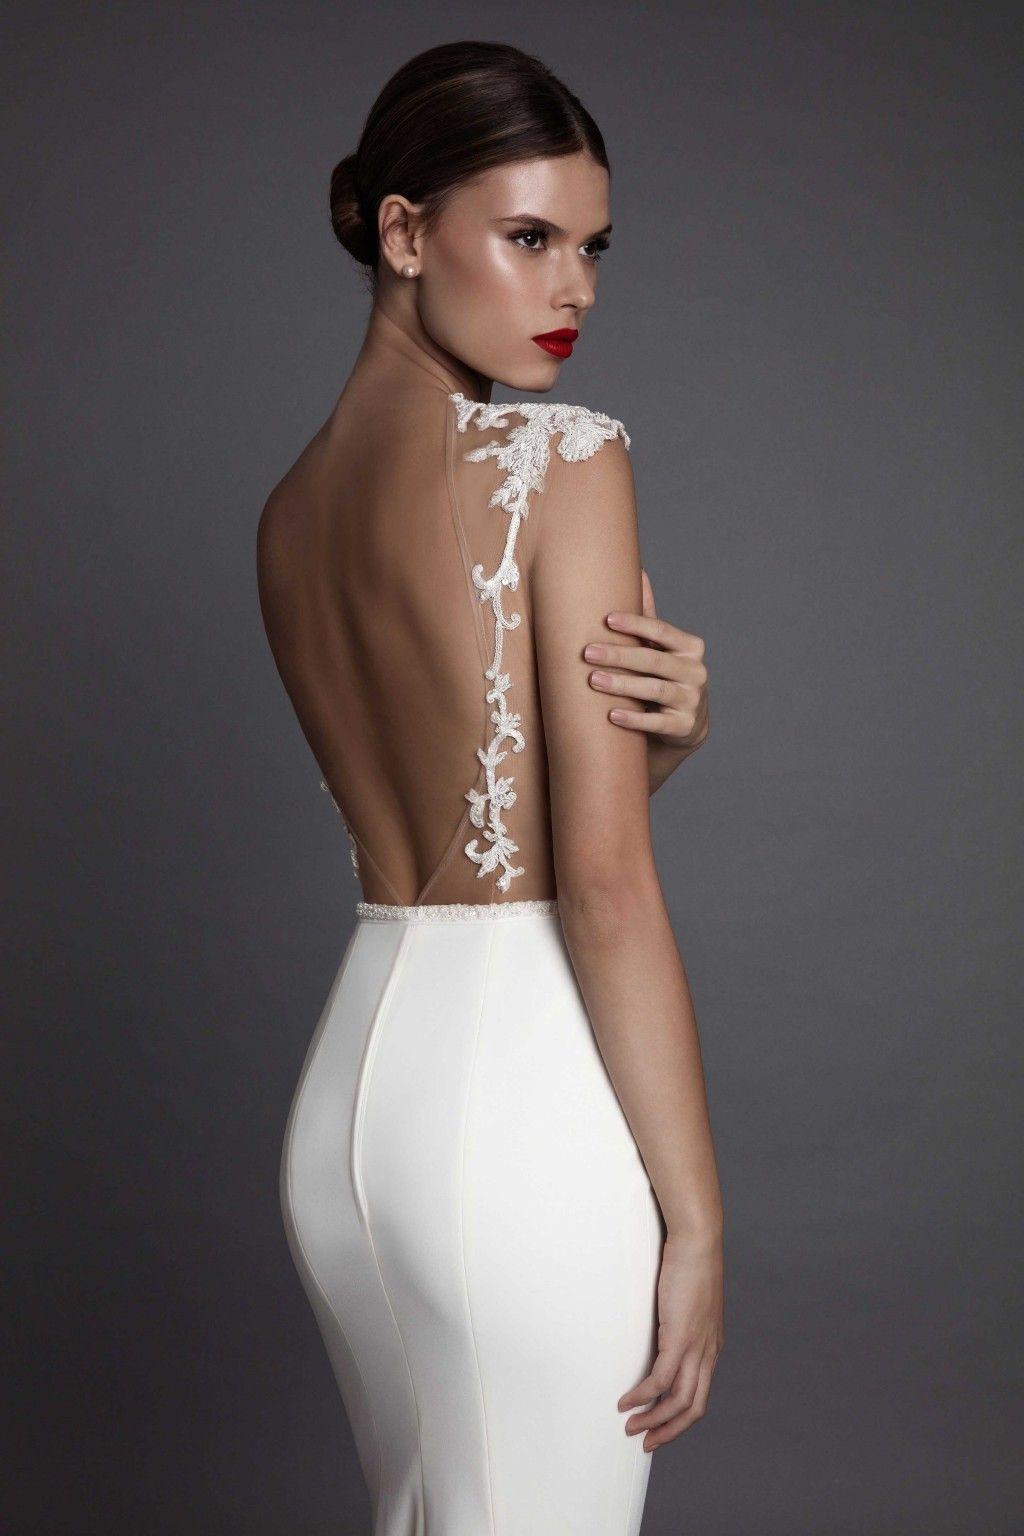 Berta Illusion Mermaid Wedding Dresses Sexy Backless Beads Appliques Wedding Gowns Floor Length Delicate Sash Wedding Dress